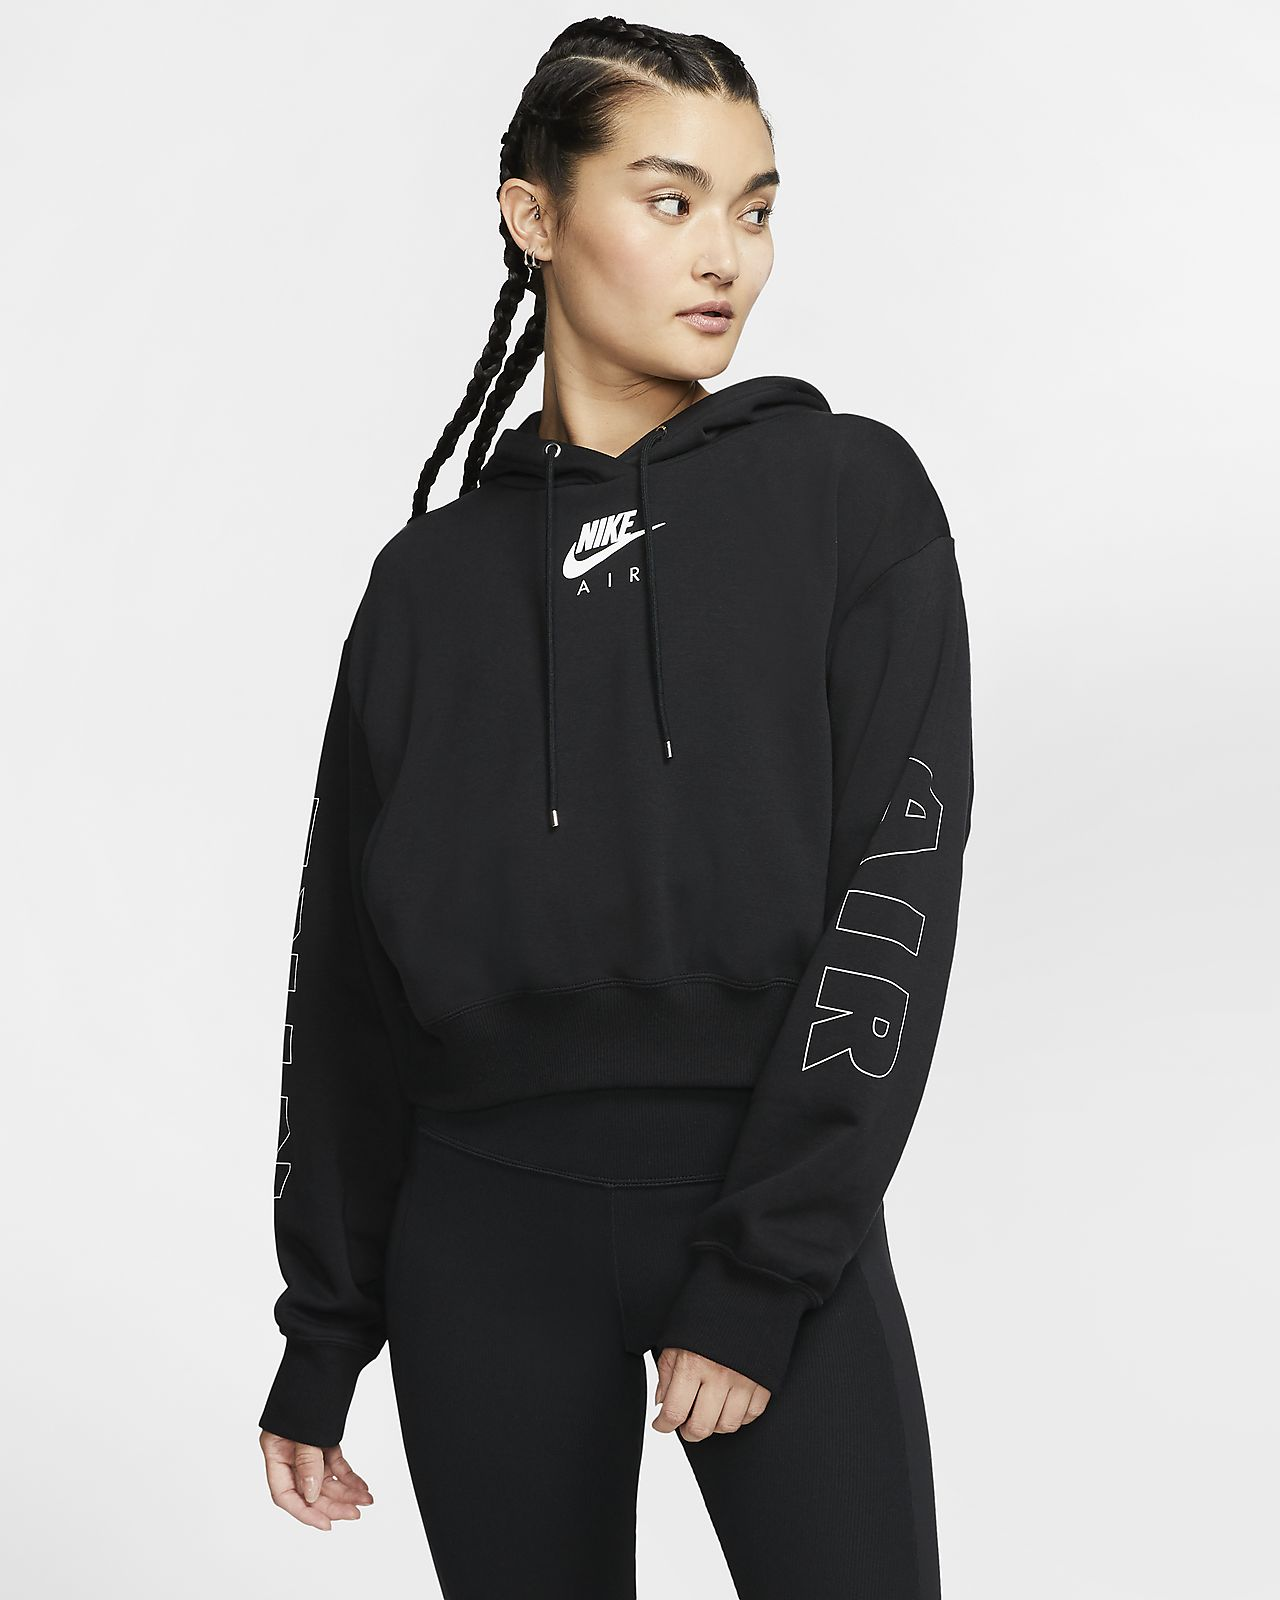 attractive price clearance sale best deals on Nike Air Women's Fleece Hoodie. Nike EG